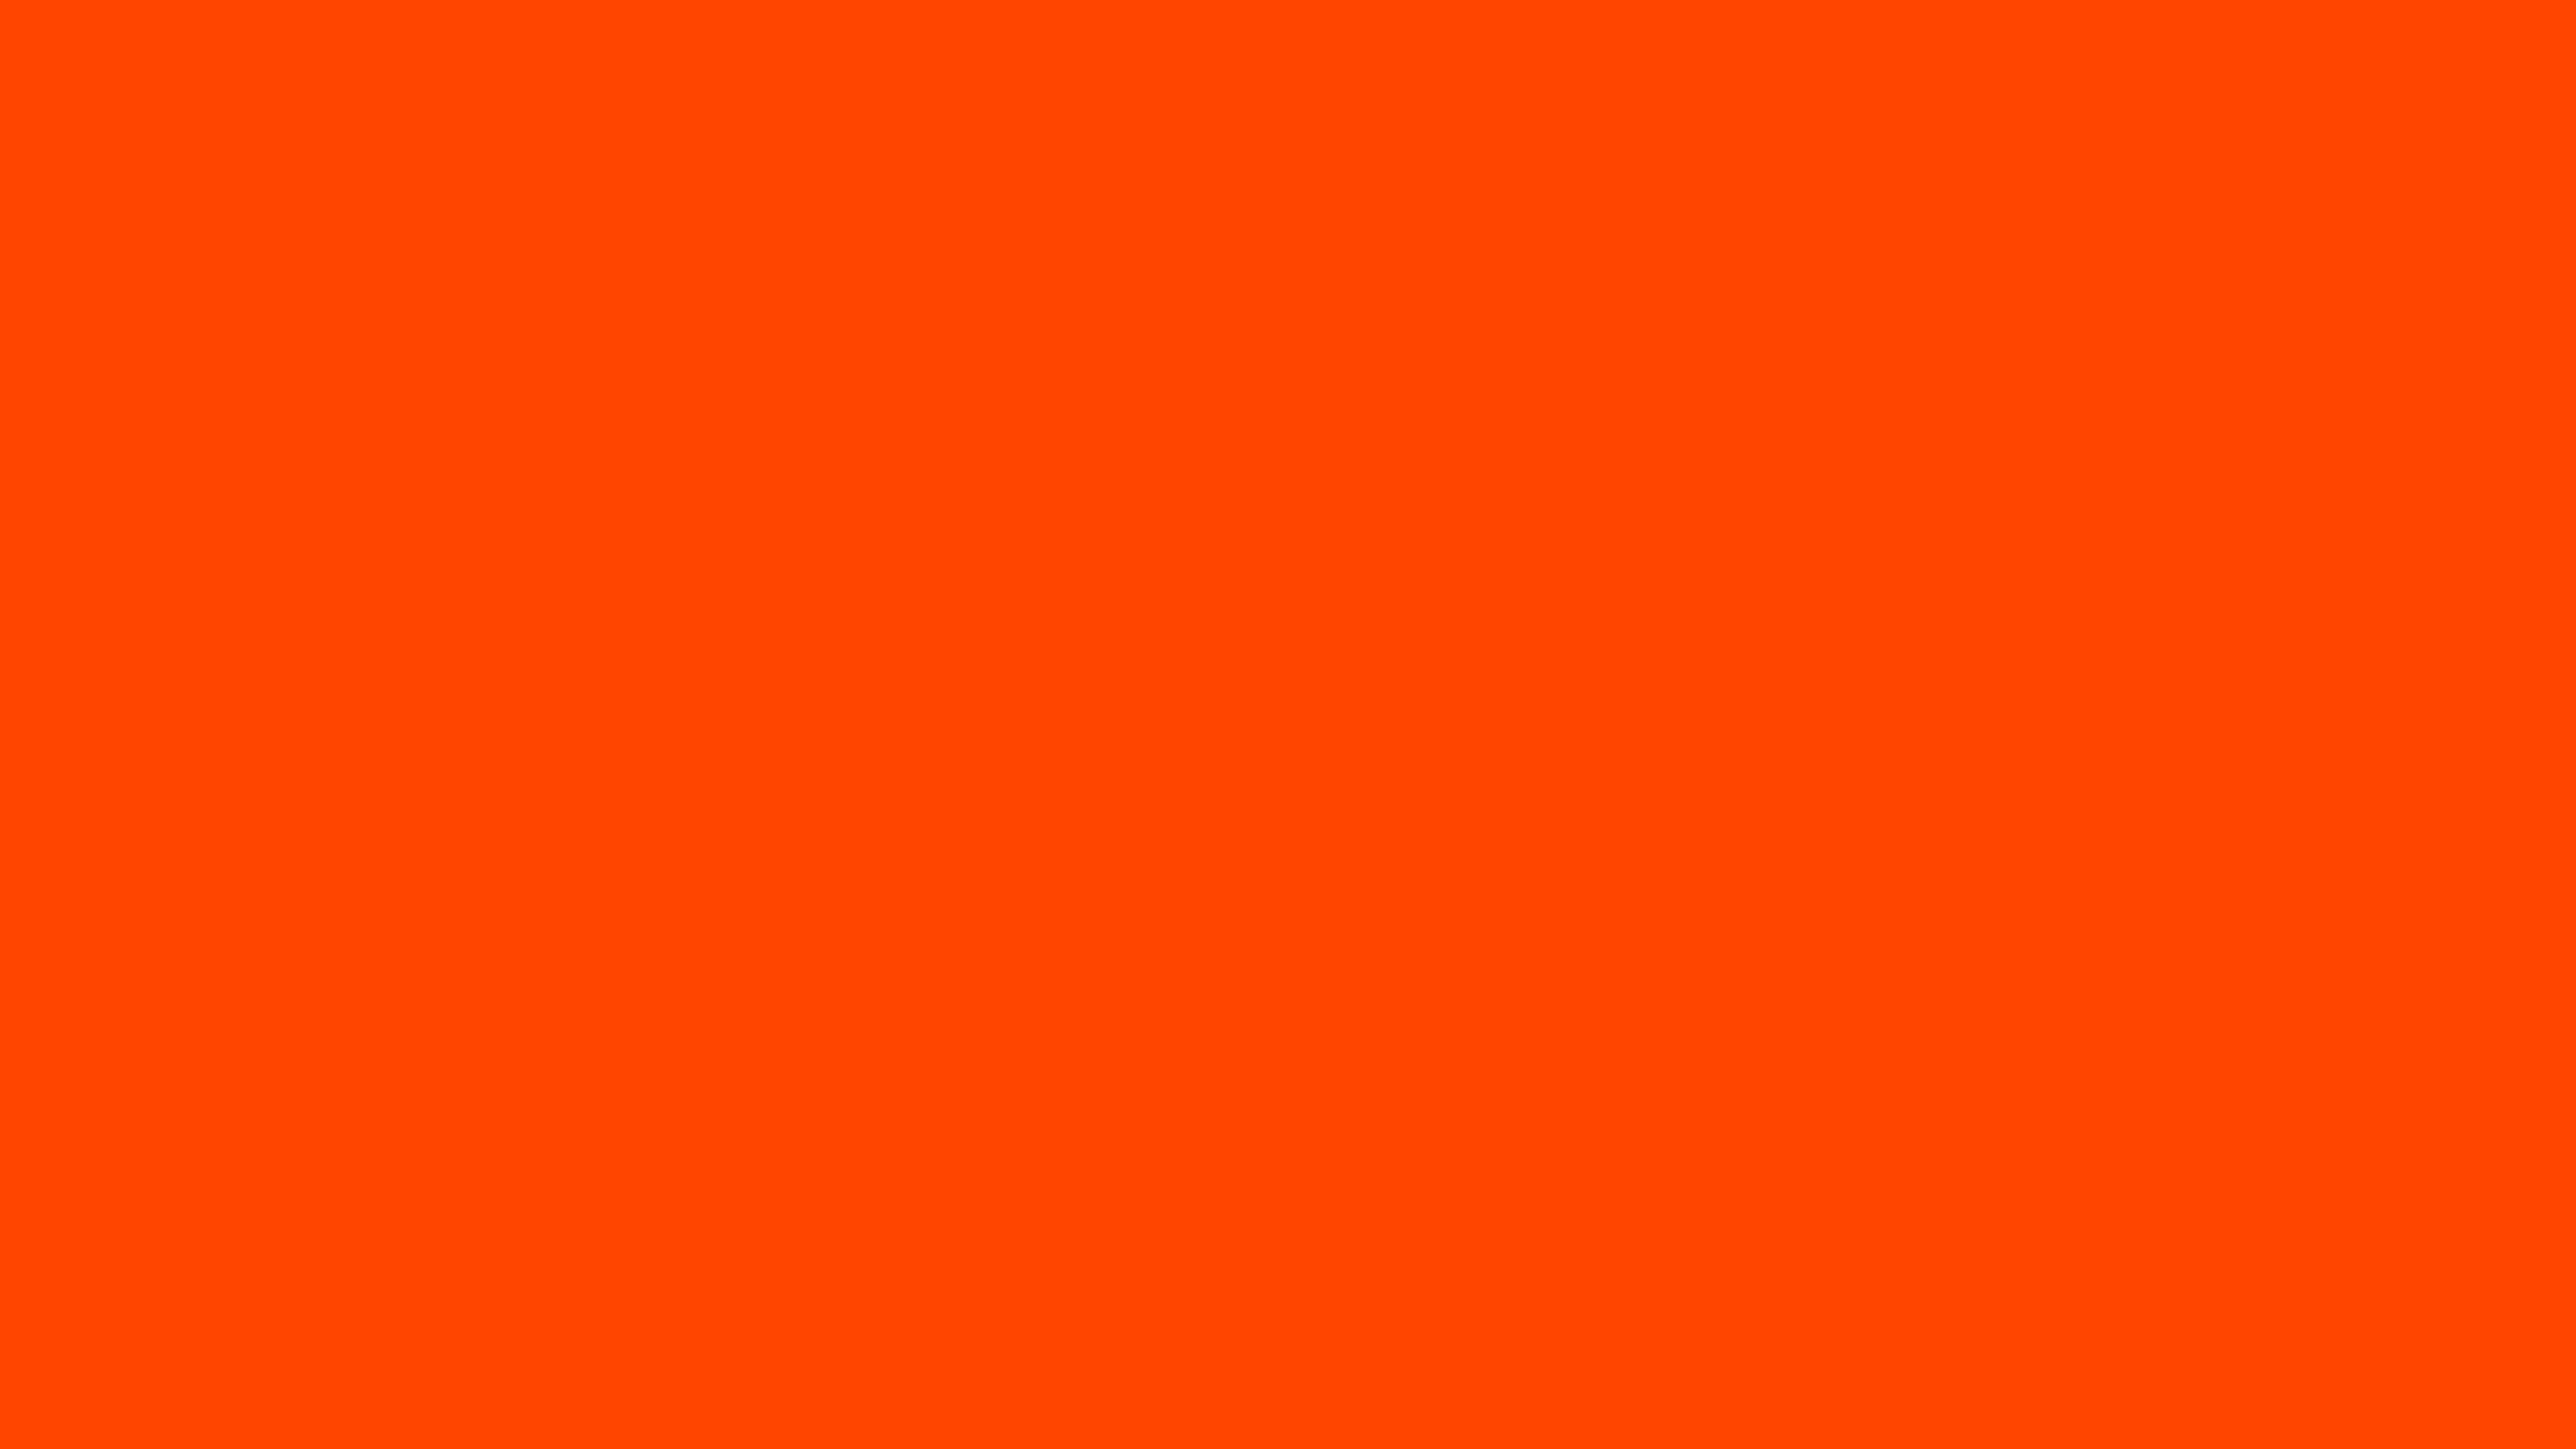 3840x2160 Orange-red Solid Color Background